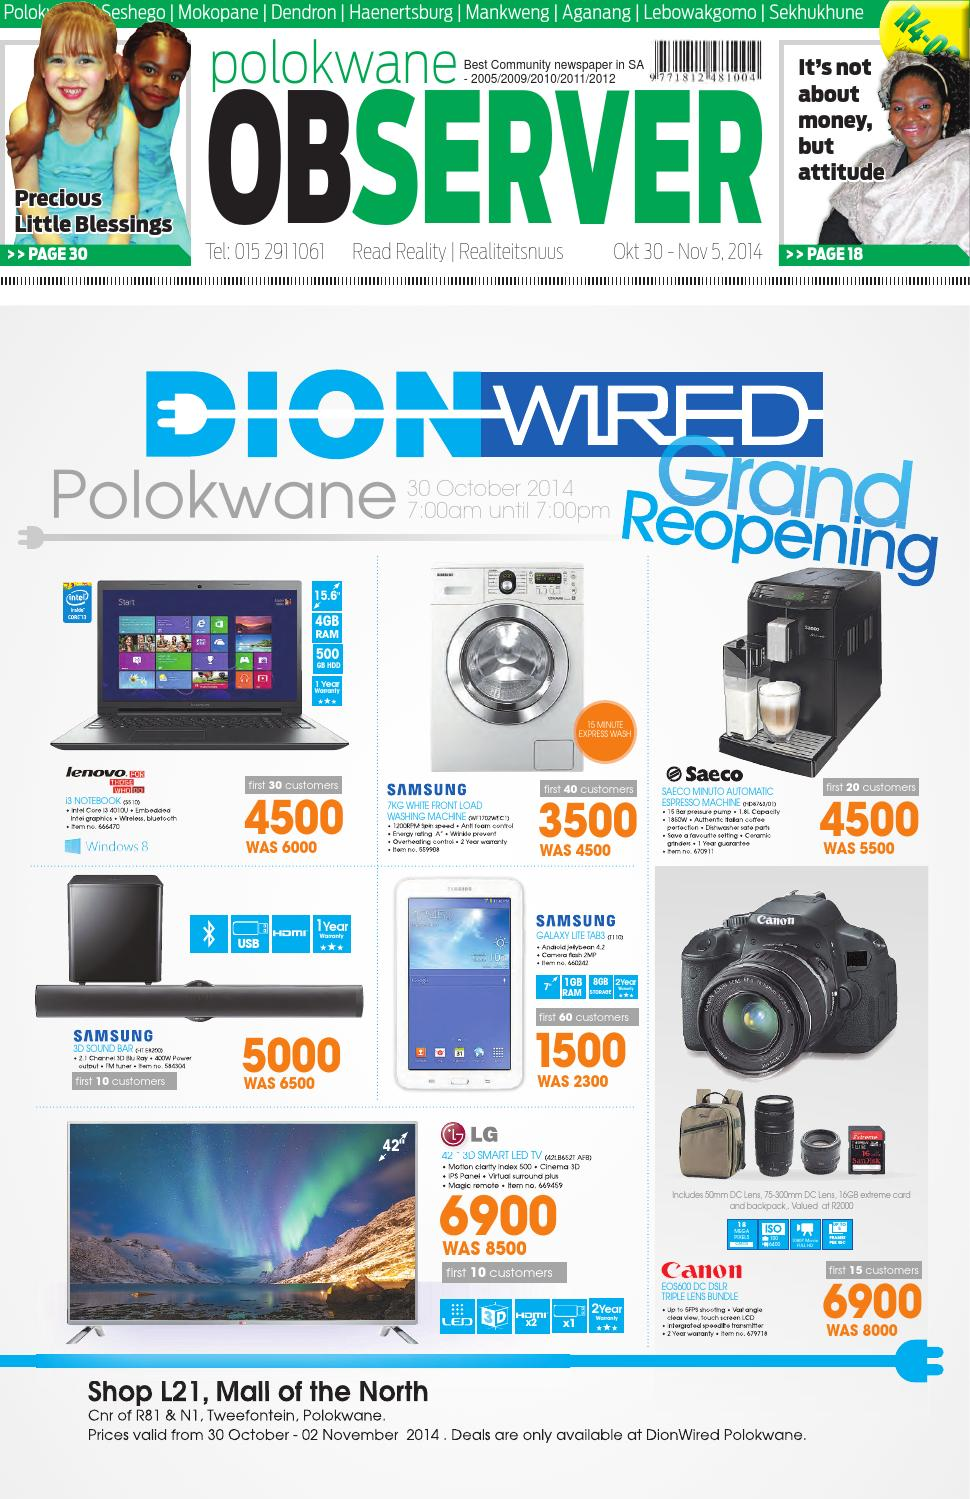 Polokwane observer 30 october 2014 by Polokwane Observer - issuu